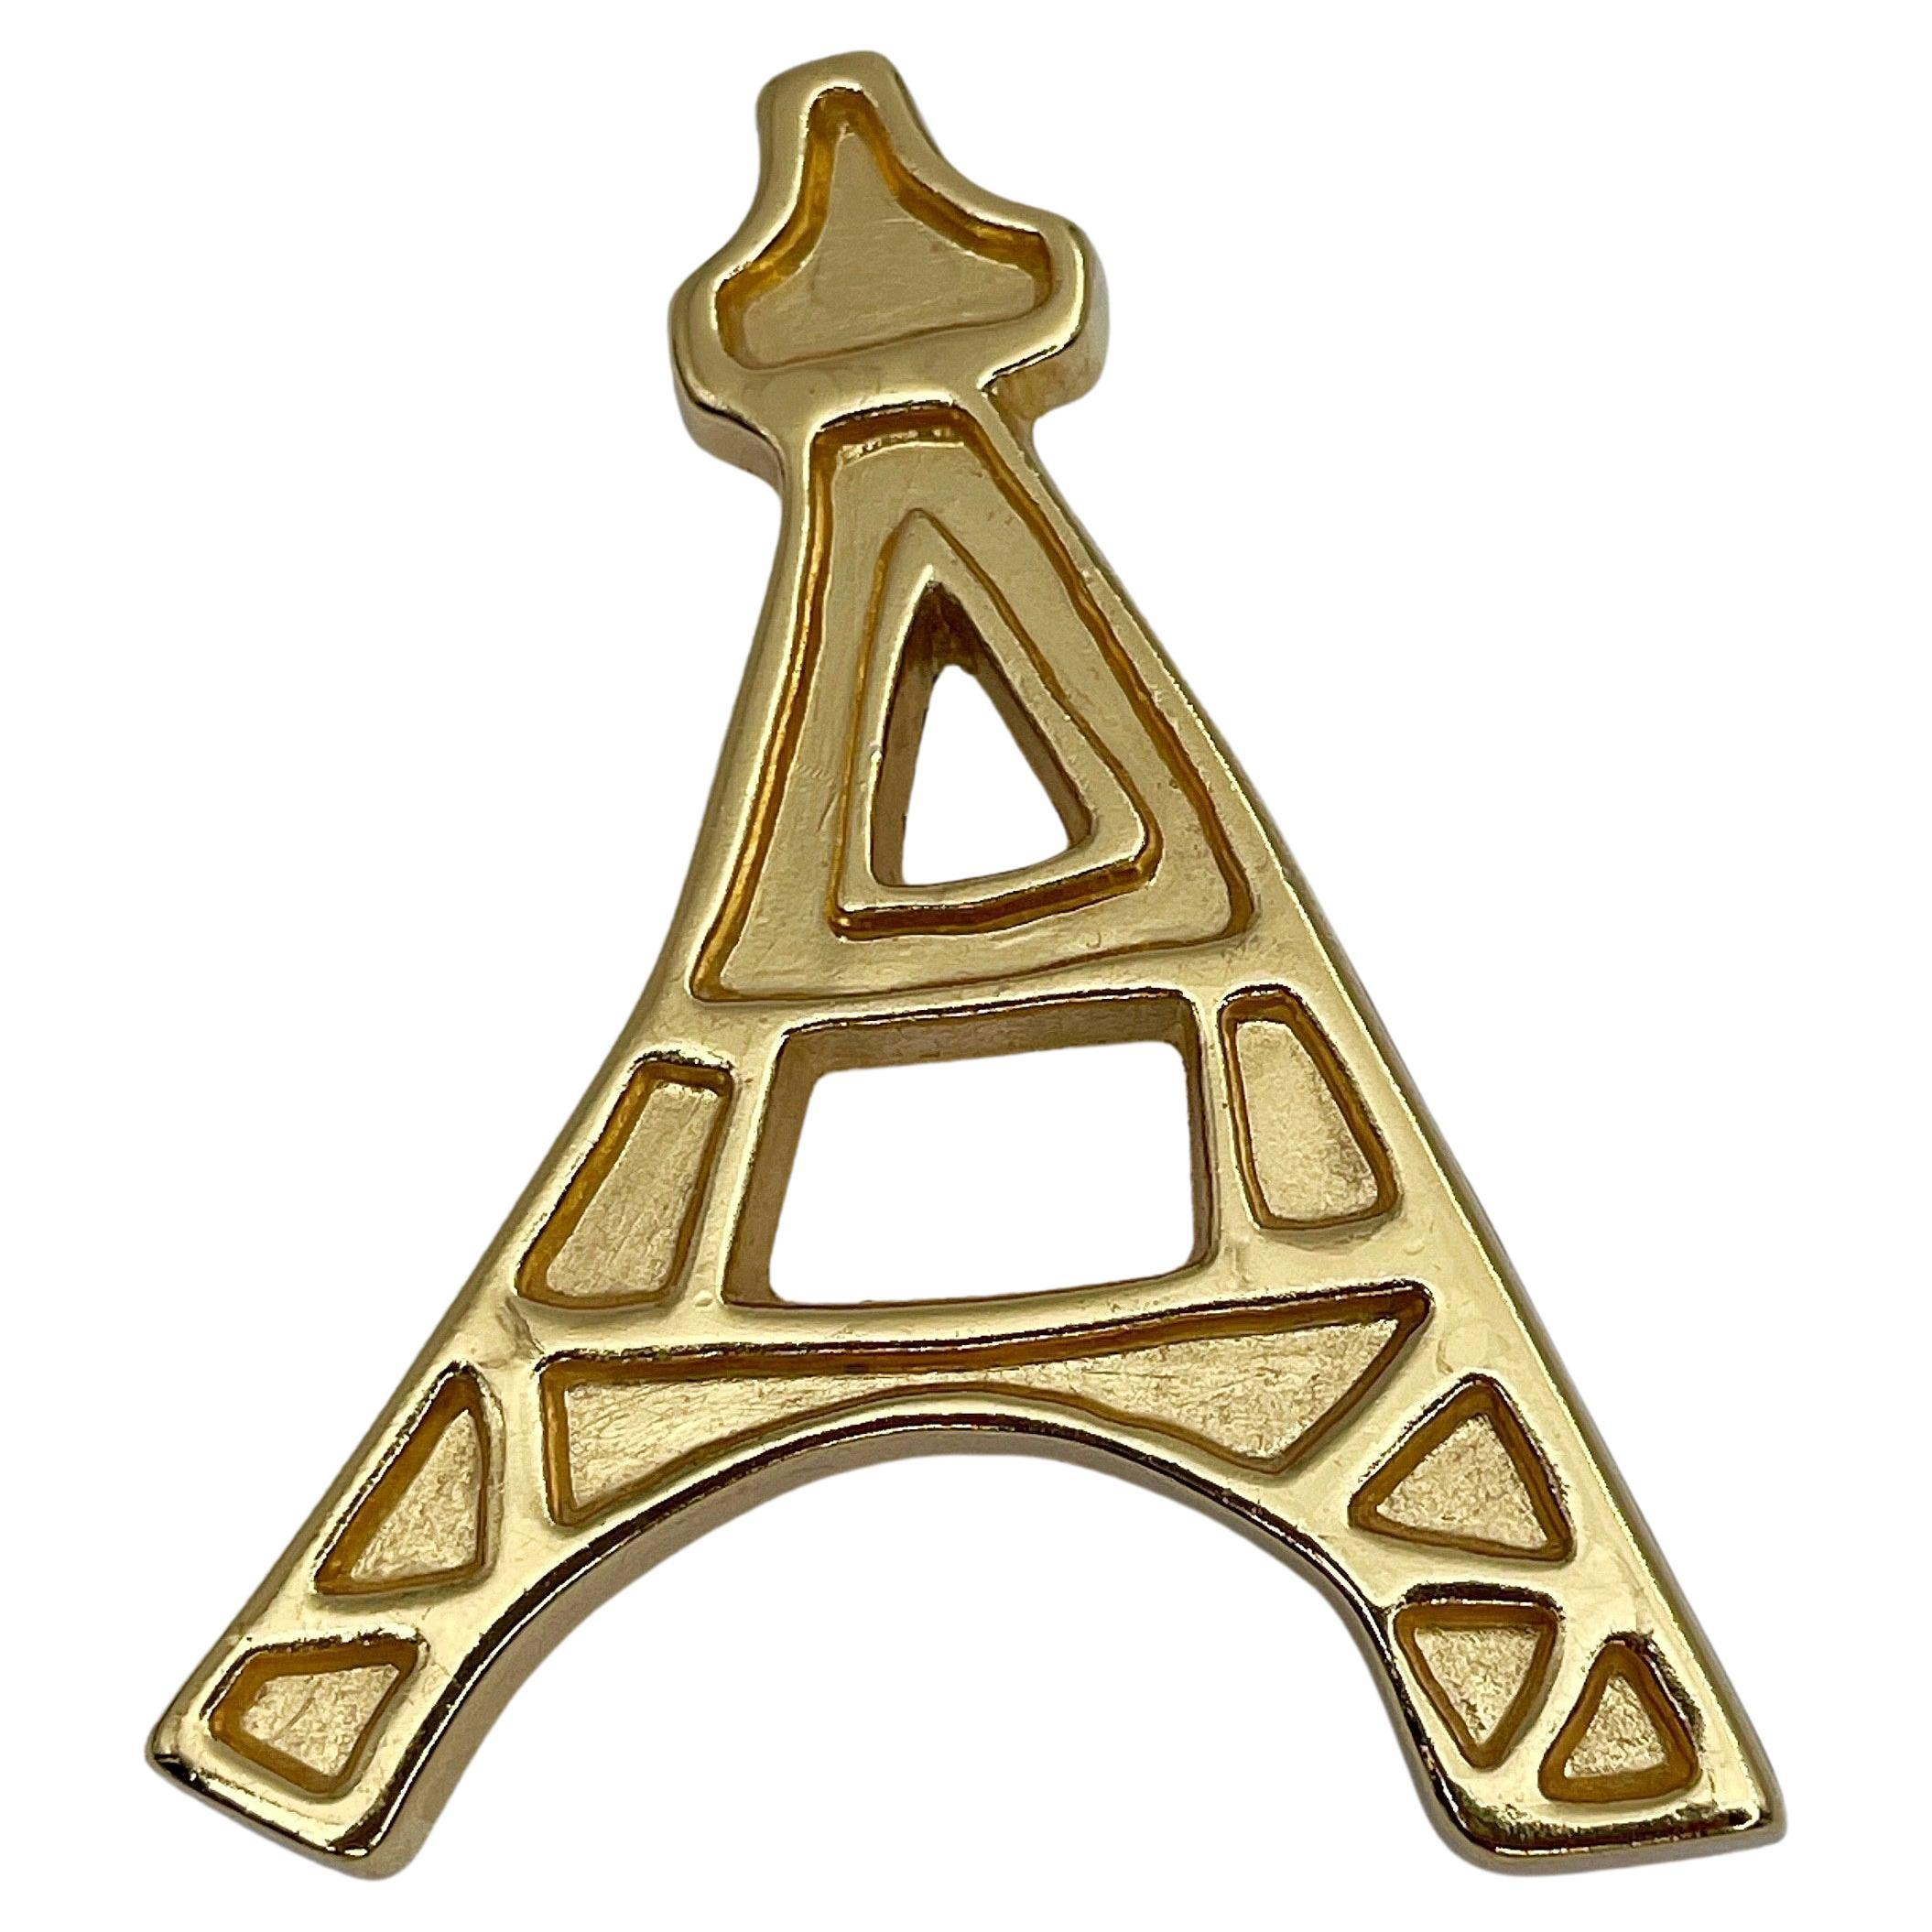 Vintage Yves Saint Laurent Iconic Gold Tone Eiffel Tower Brooch